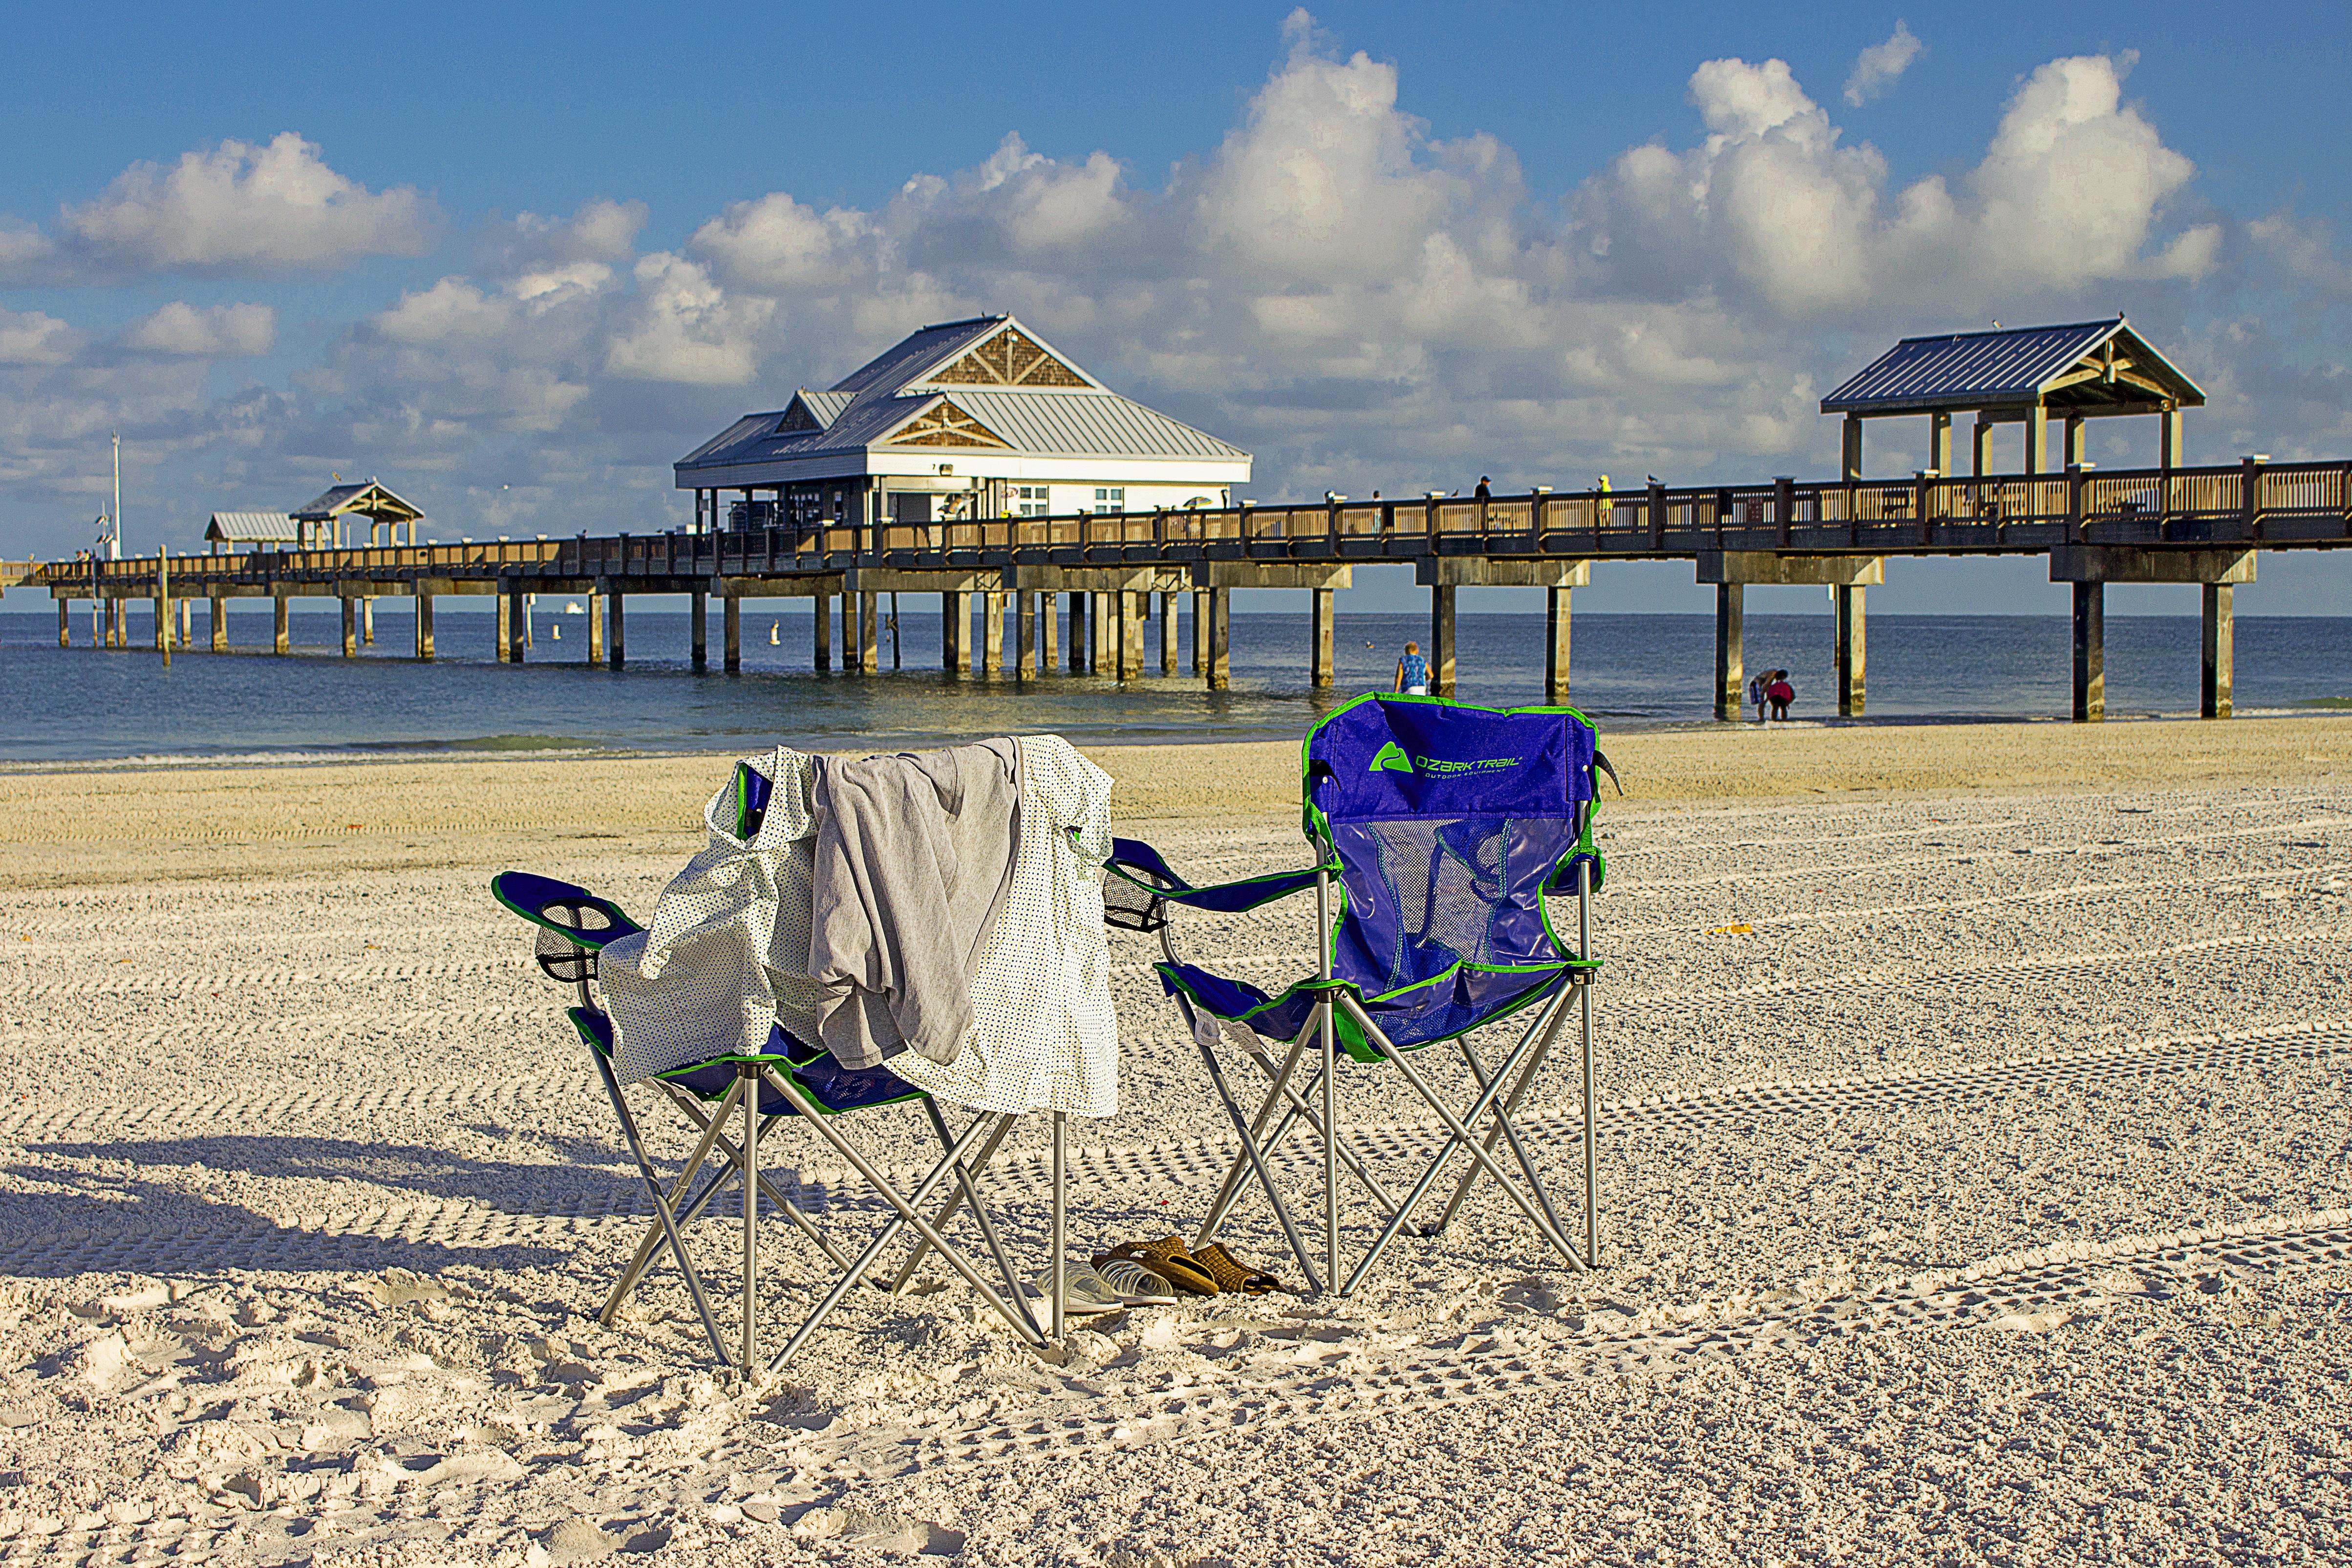 Beach Sea Coast Water Sand Ocean Horizon Sky Boardwalk S Pier Vacation Tourism Leisure Body Of